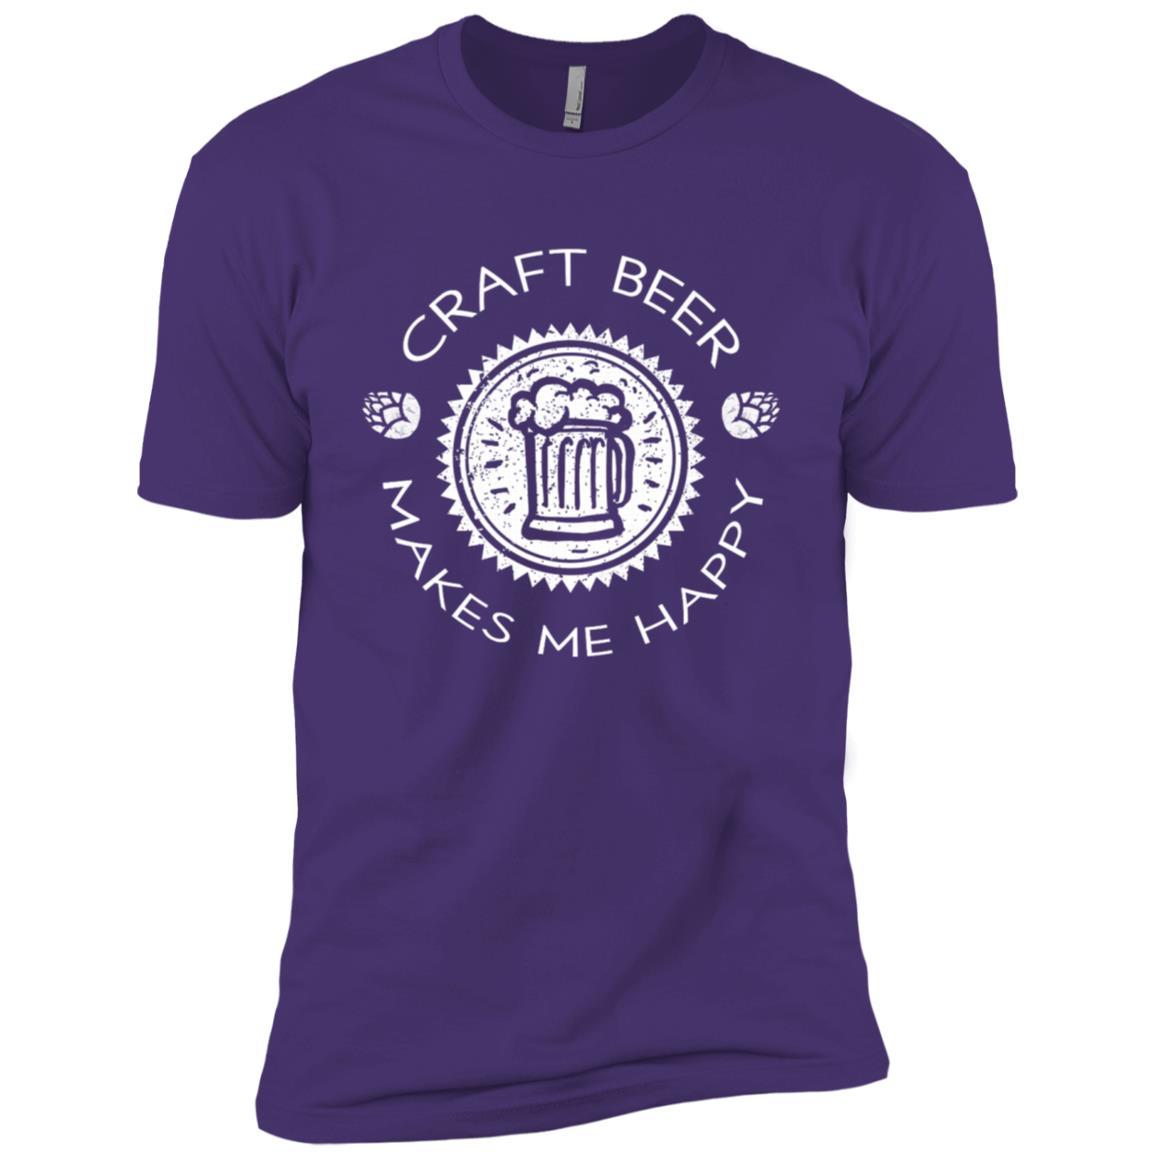 Craft Beer Makes Me Happy Funny Drink Lover Gift Men Short Sleeve T-Shirt